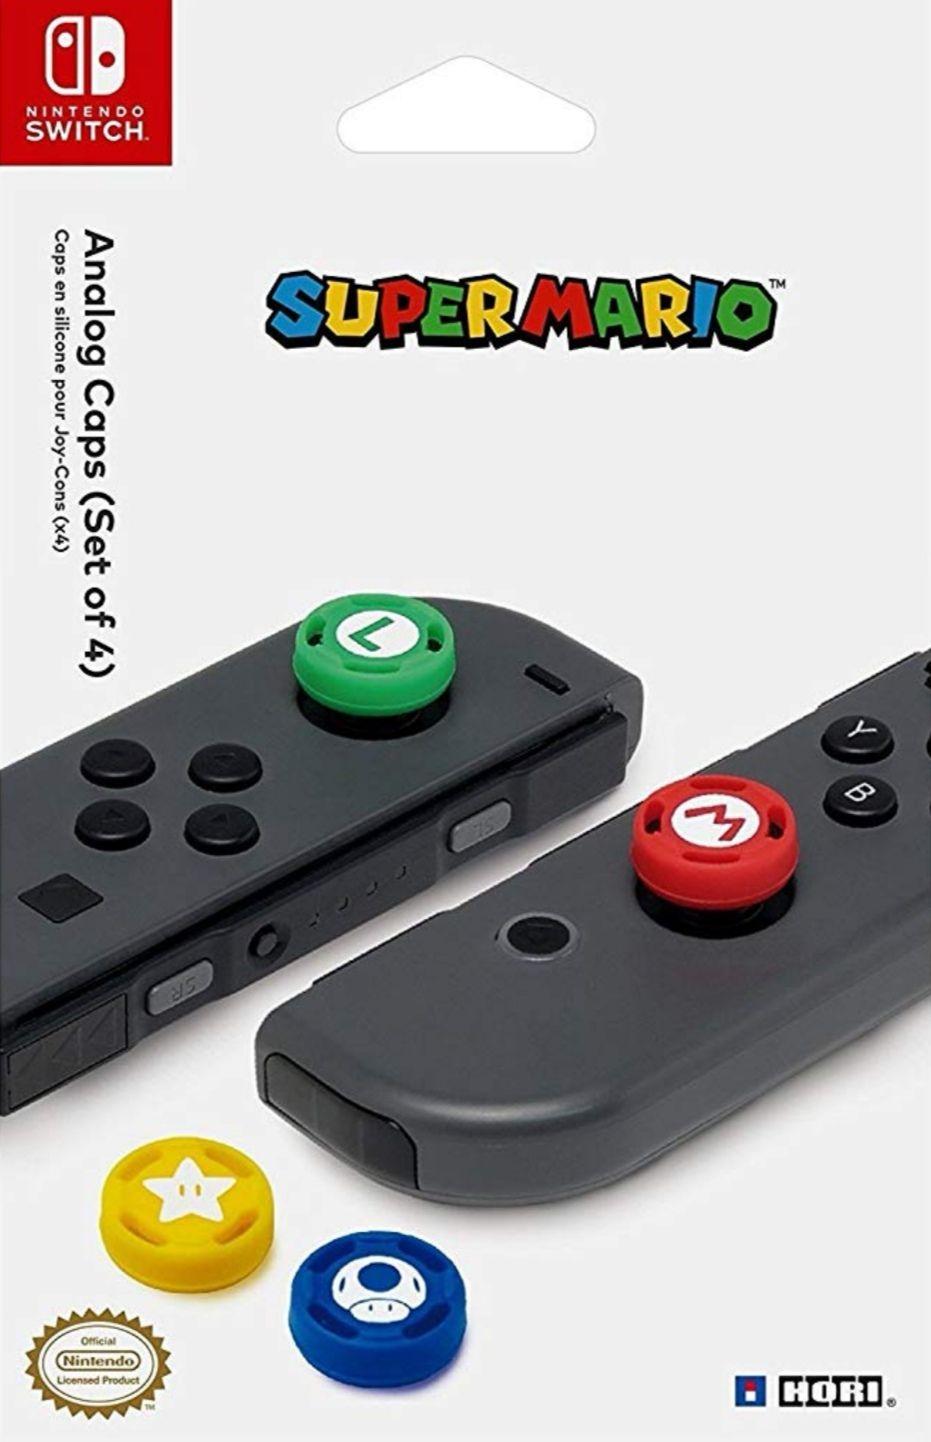 Amazon: Super Mario Analog Caps - Nintendo Switch